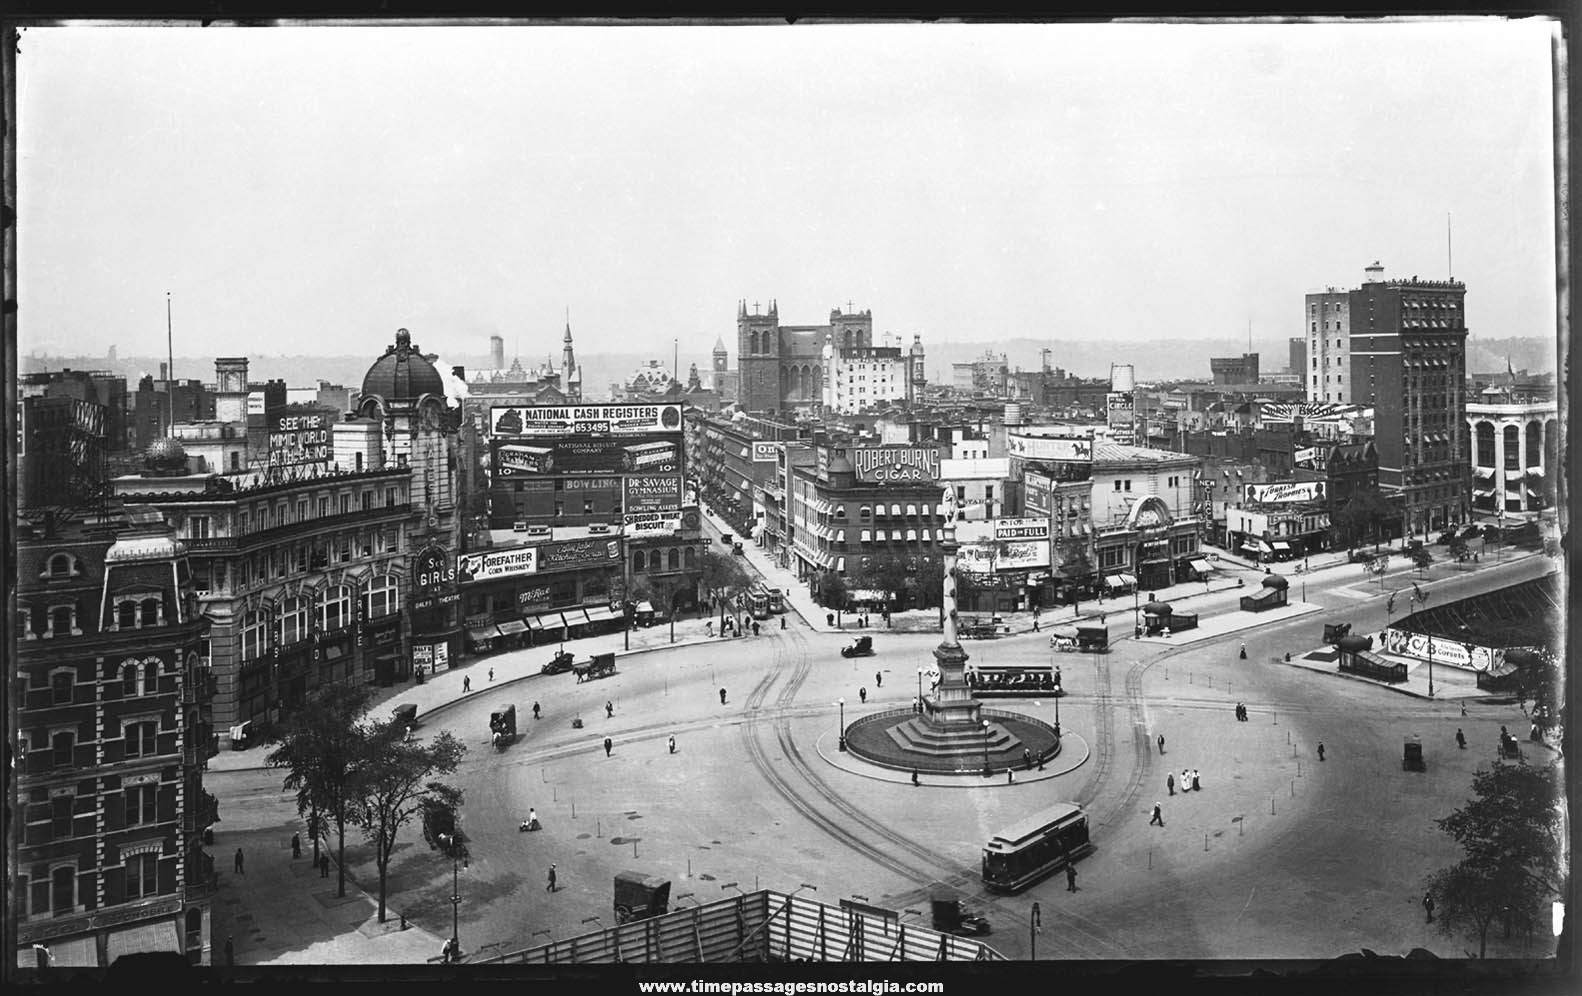 Early Rare Columbus Circle Manhattan New York Large Format Photograph Negative